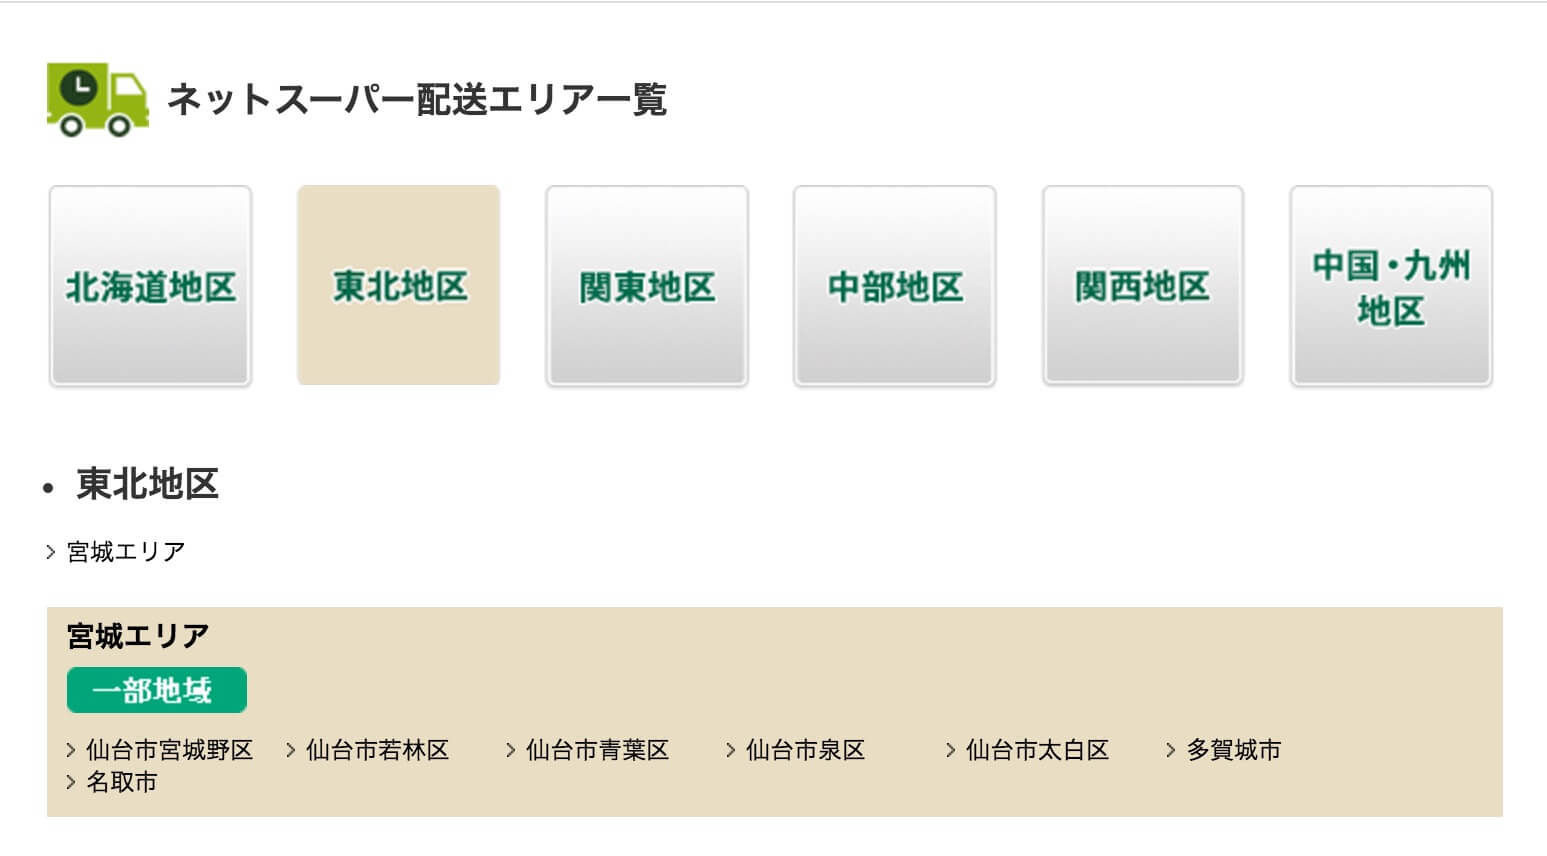 seiyu-net-supermarket-2